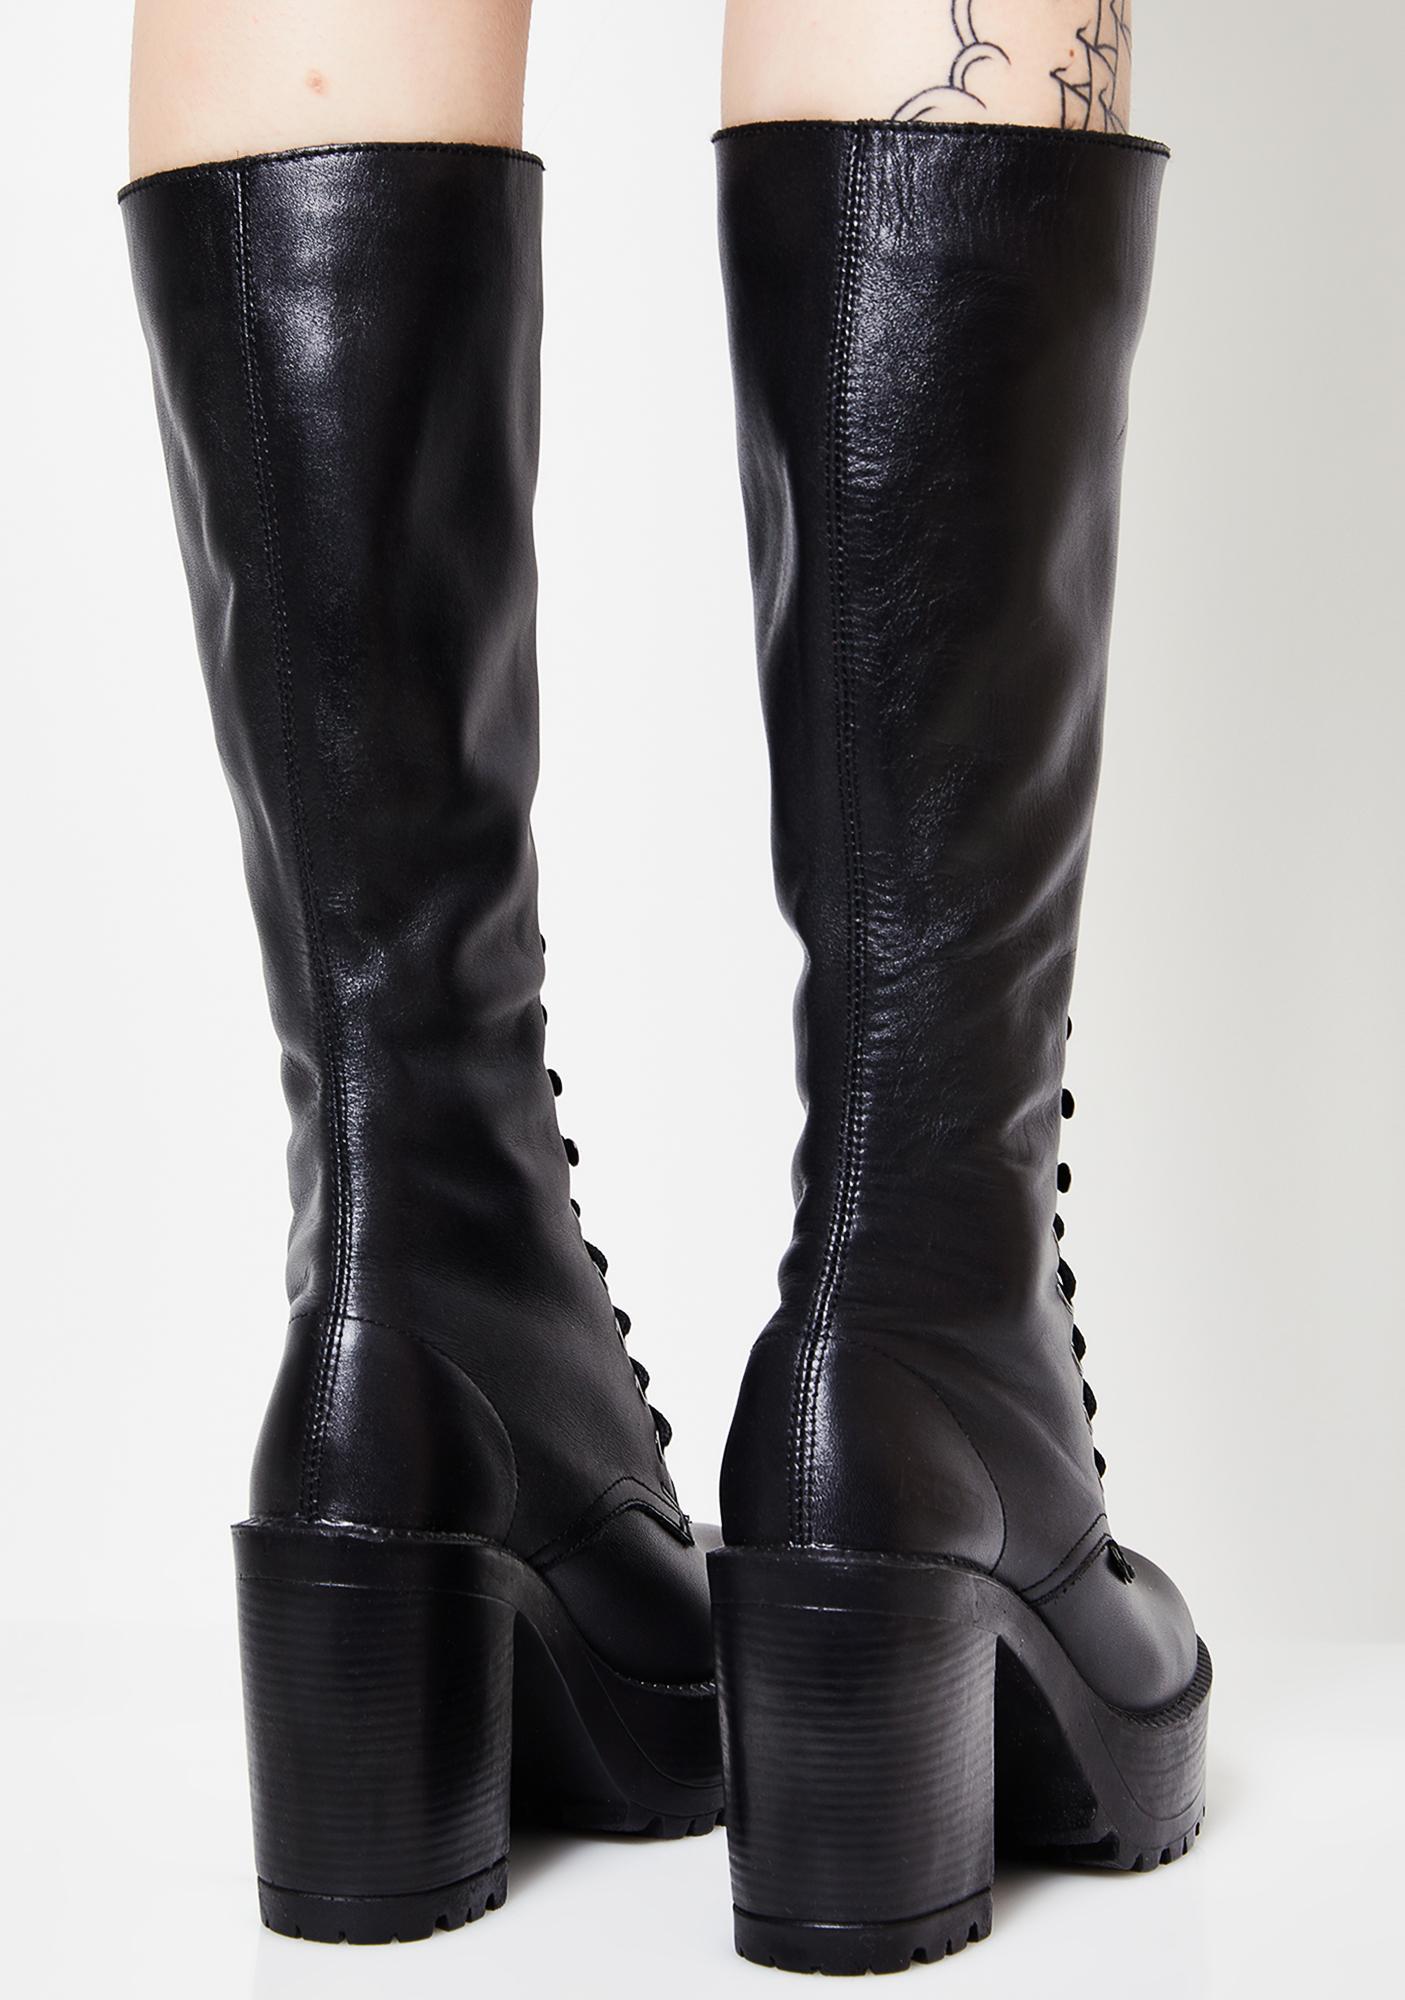 ROC Boots Australia Lash Boots